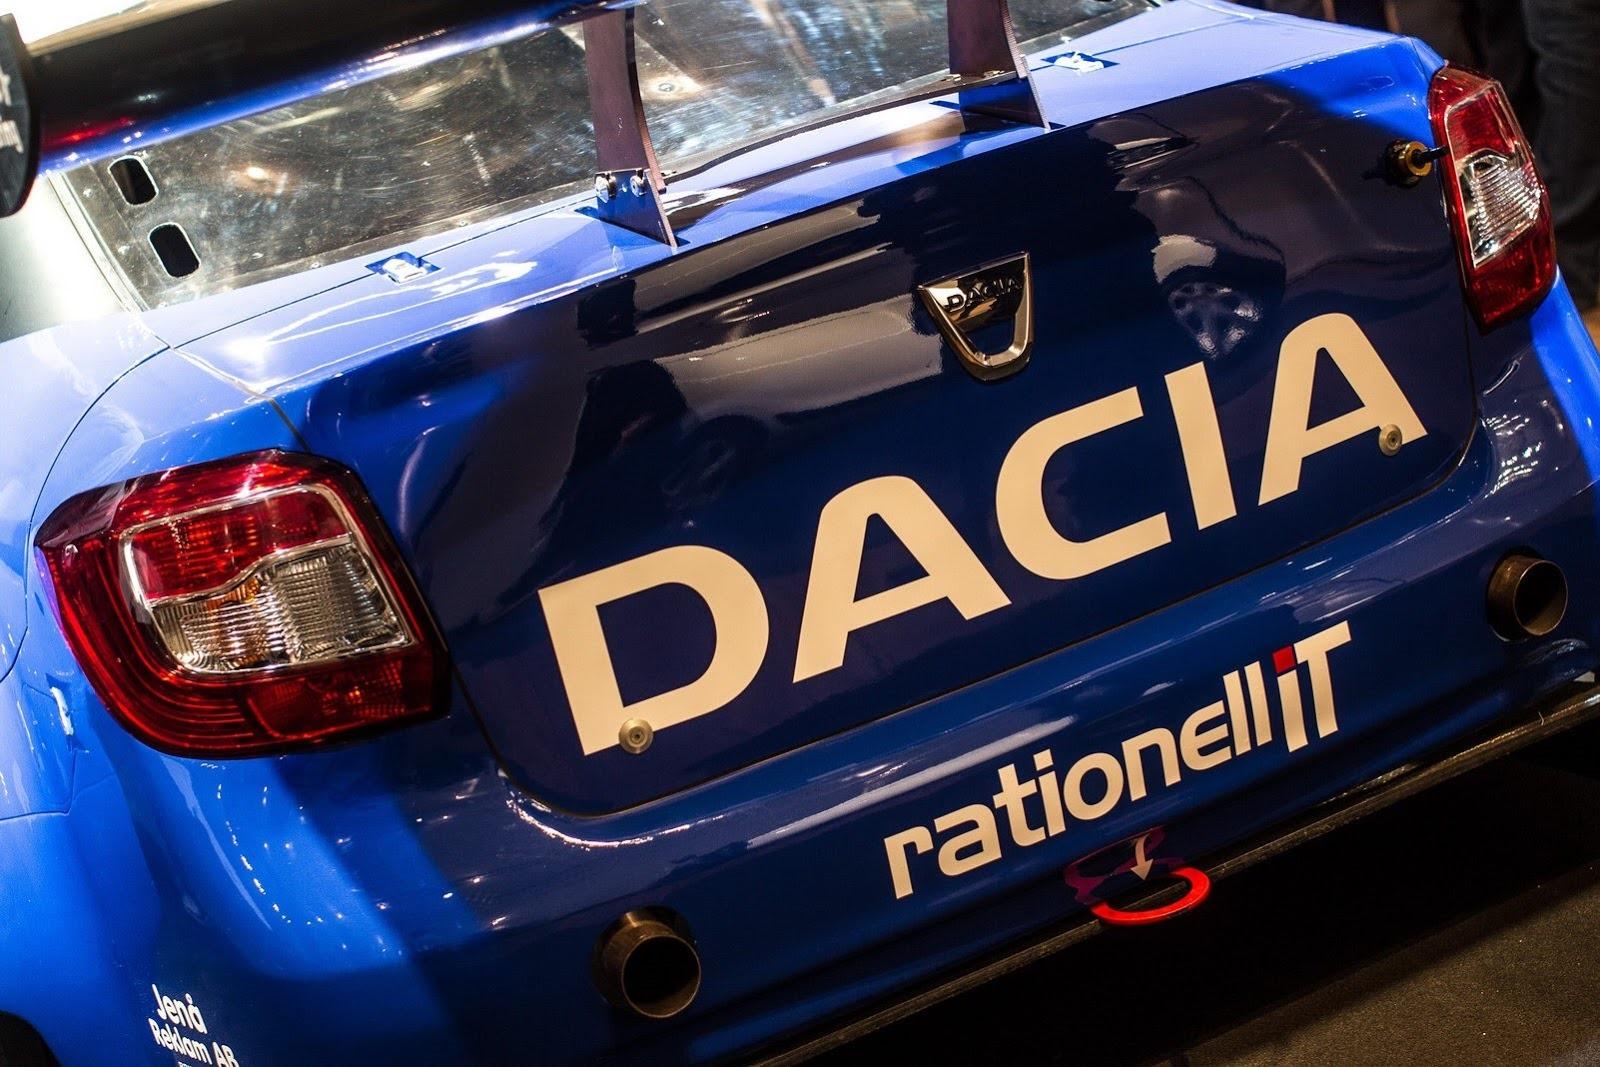 2013 Dacia Logan STCC 2